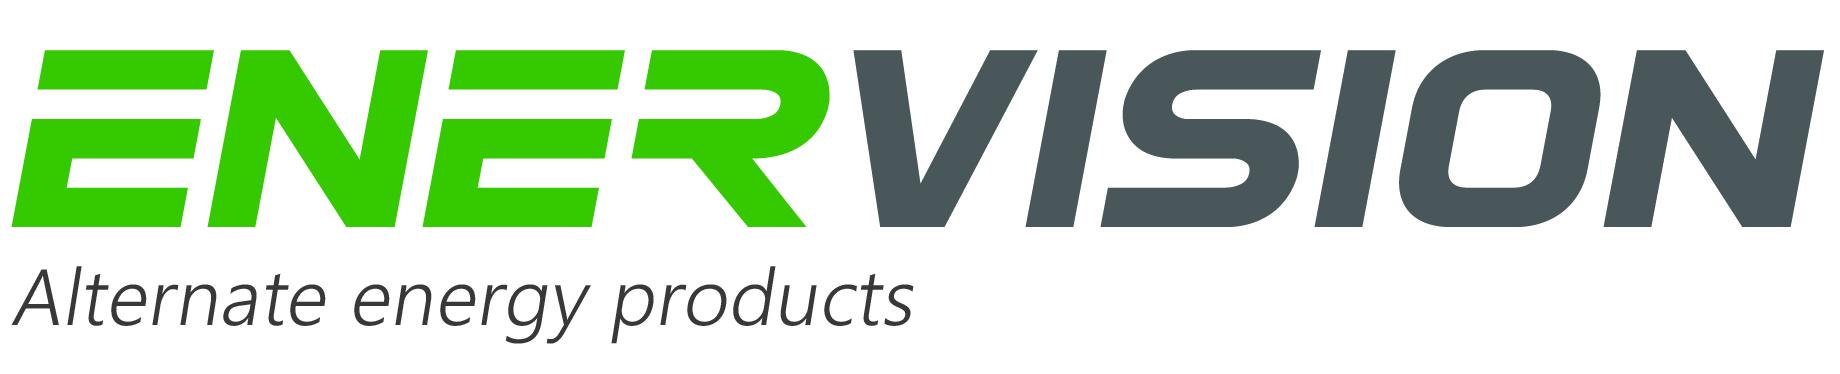 Enervision_logo high